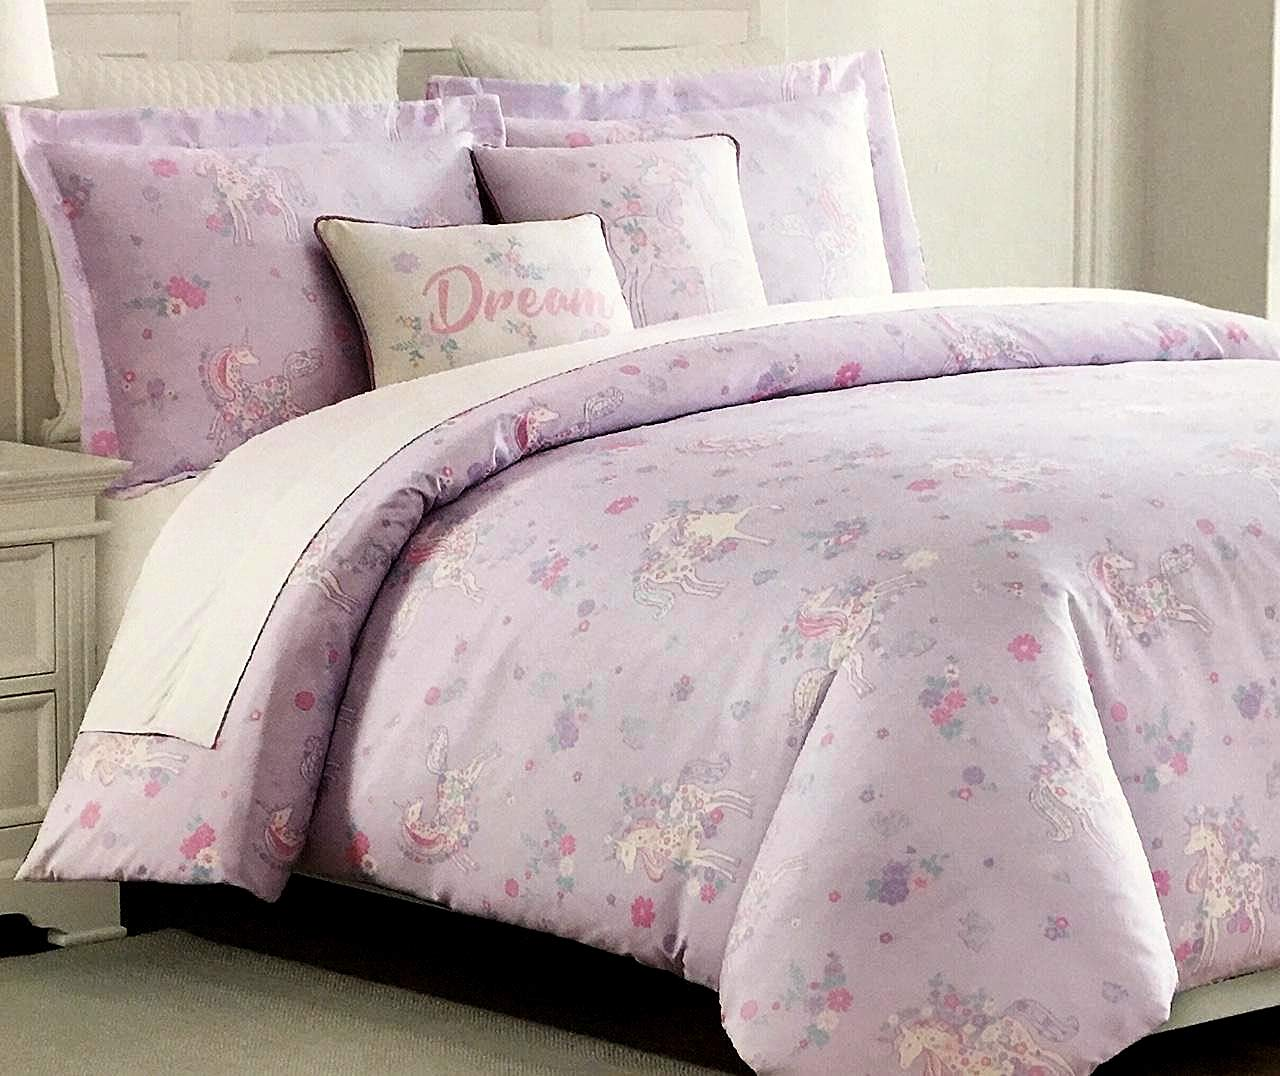 Unicorns and Spring Flowers All-Season Girls Twin Comforter Set by Nicole Miller Nicol Miller Kids